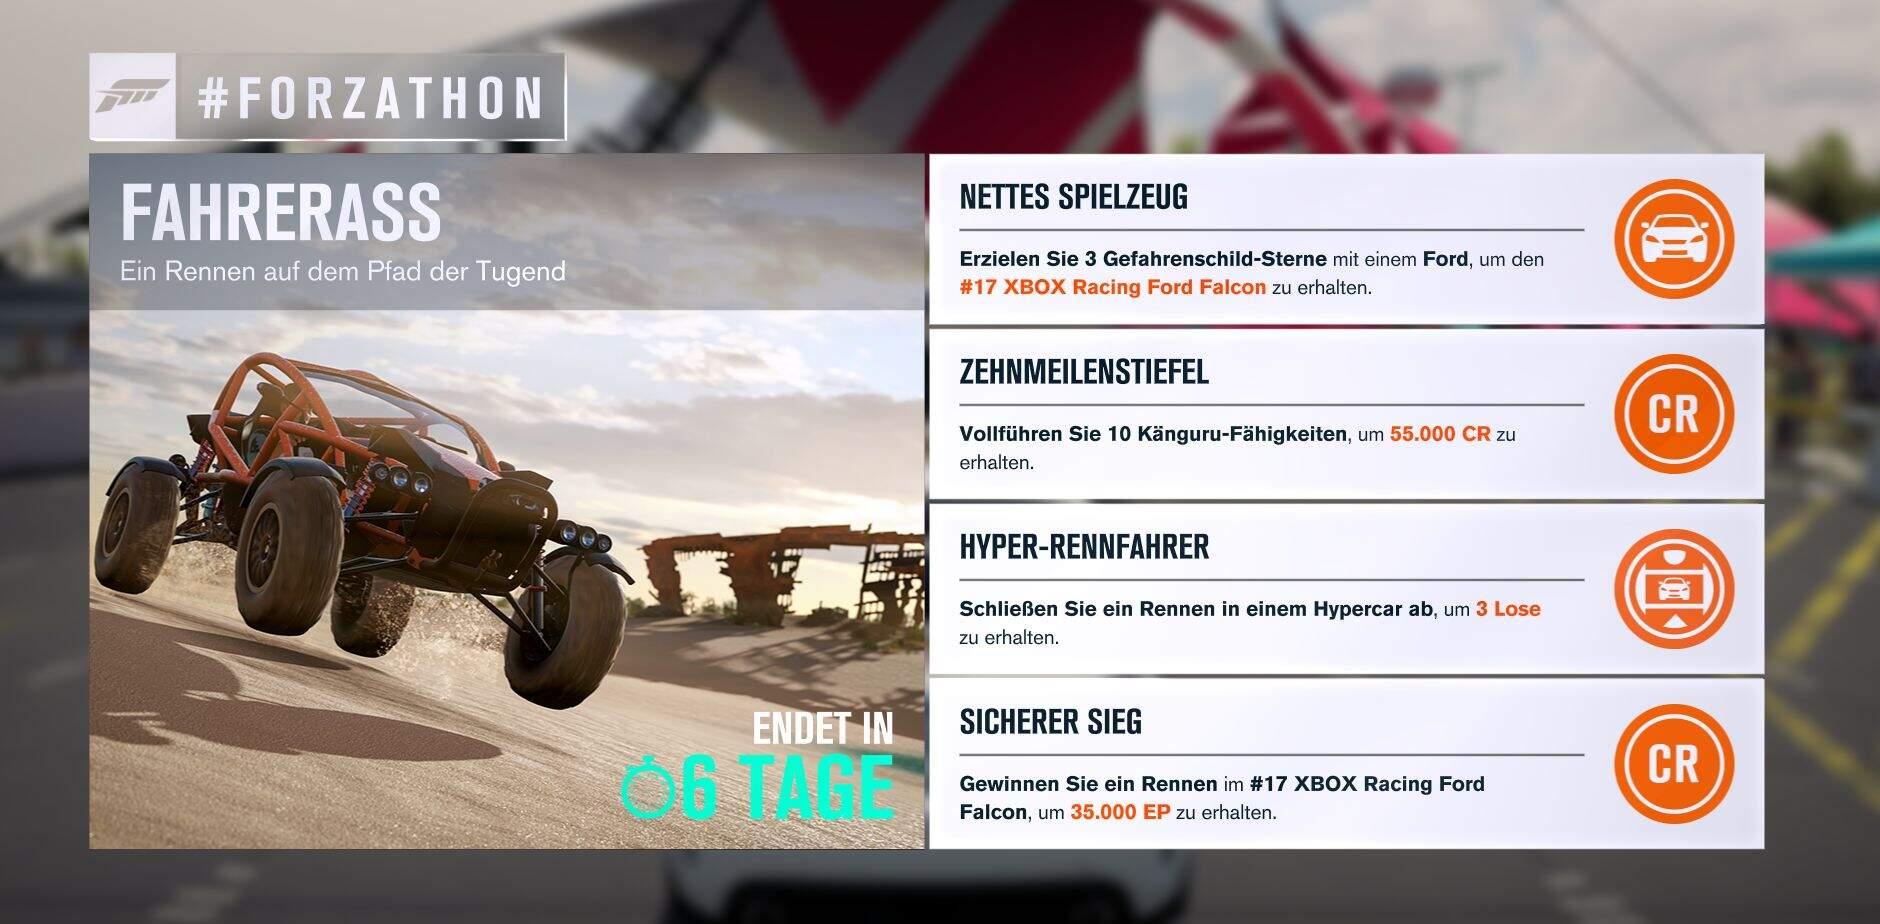 Forza Horizon 3 #Forzathon Guide KW 37 – Fahrerass